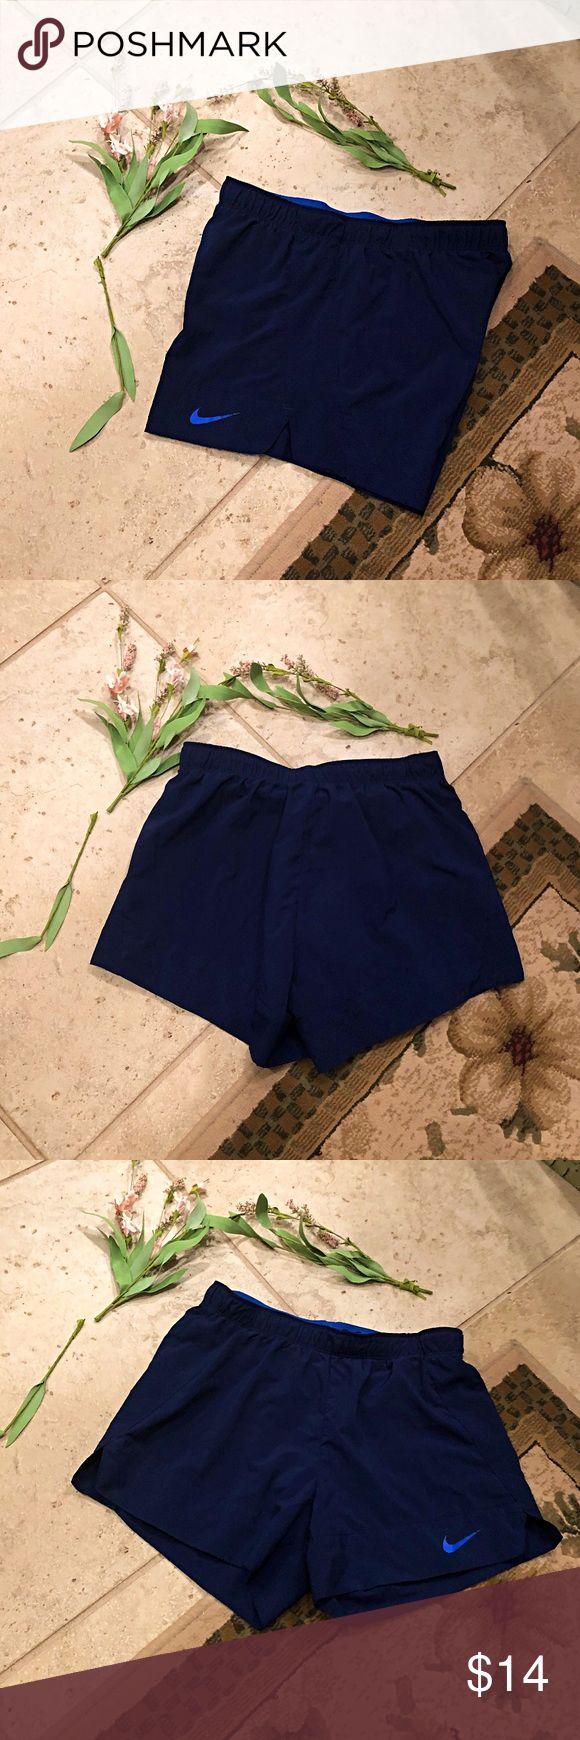 Nike Shorts Damen navy Nike Shorts mit blauem Nike Check unten links …   – My Posh Picks